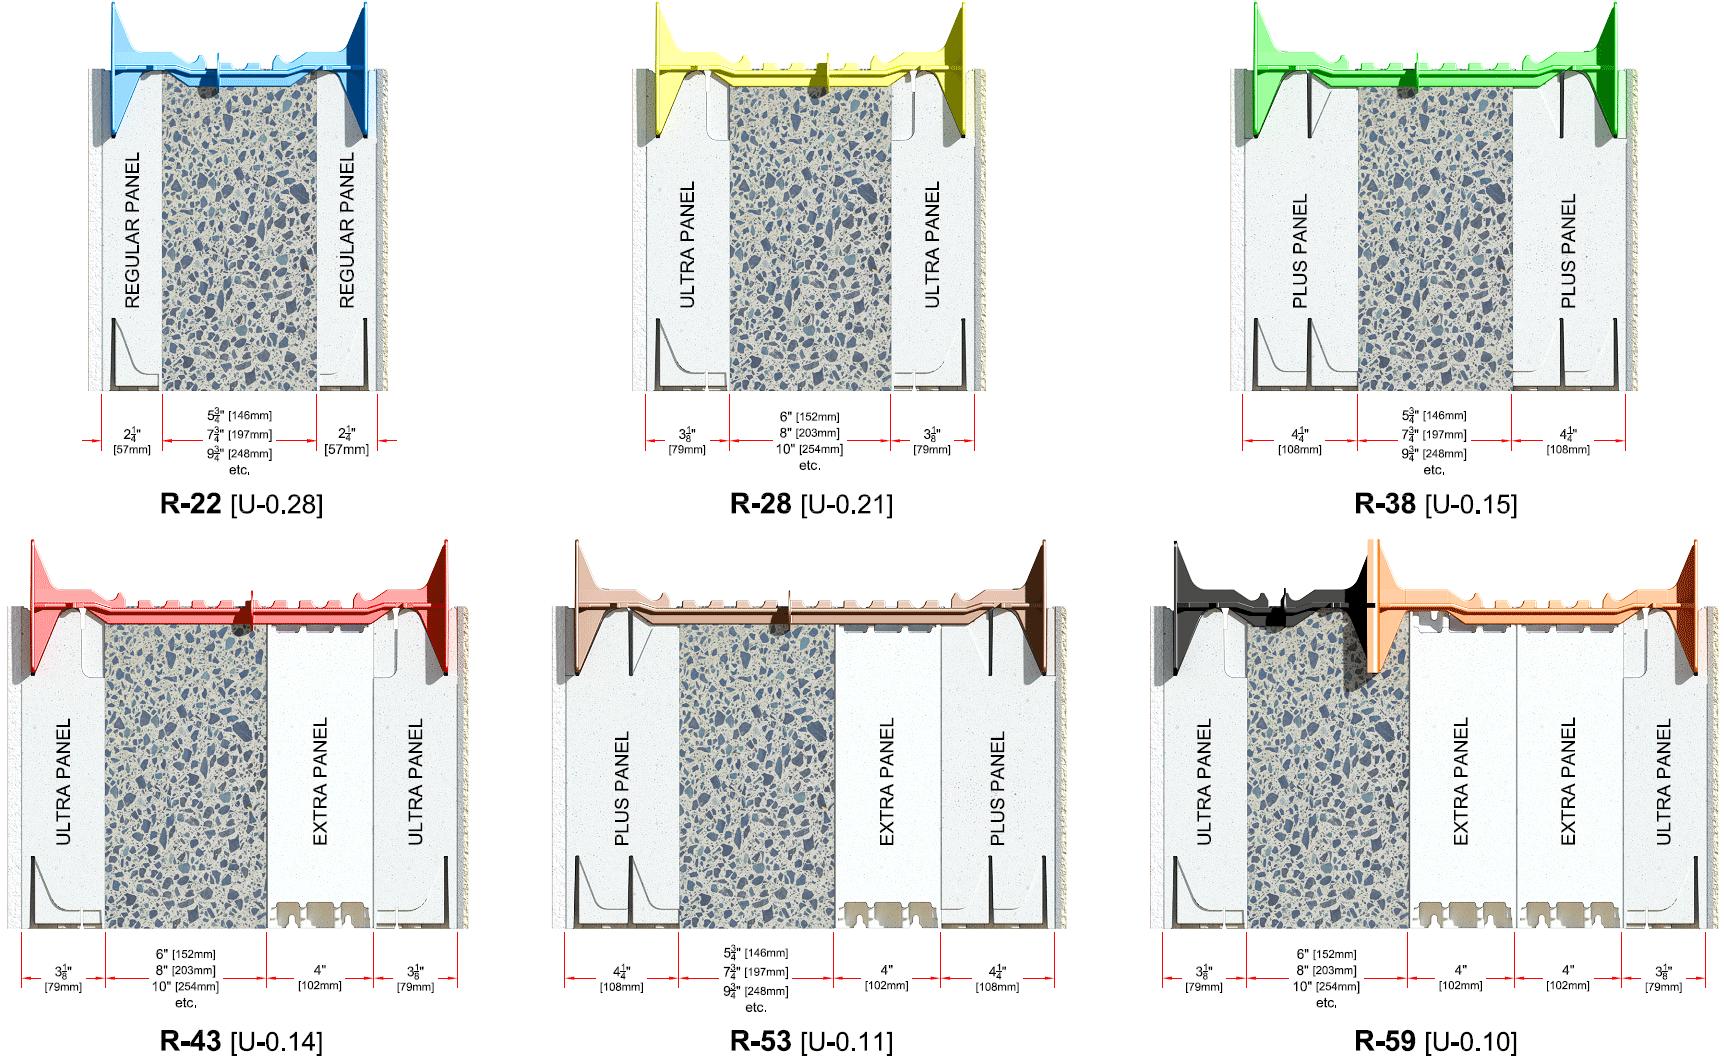 Fiberglass Insulation Hkinsulation